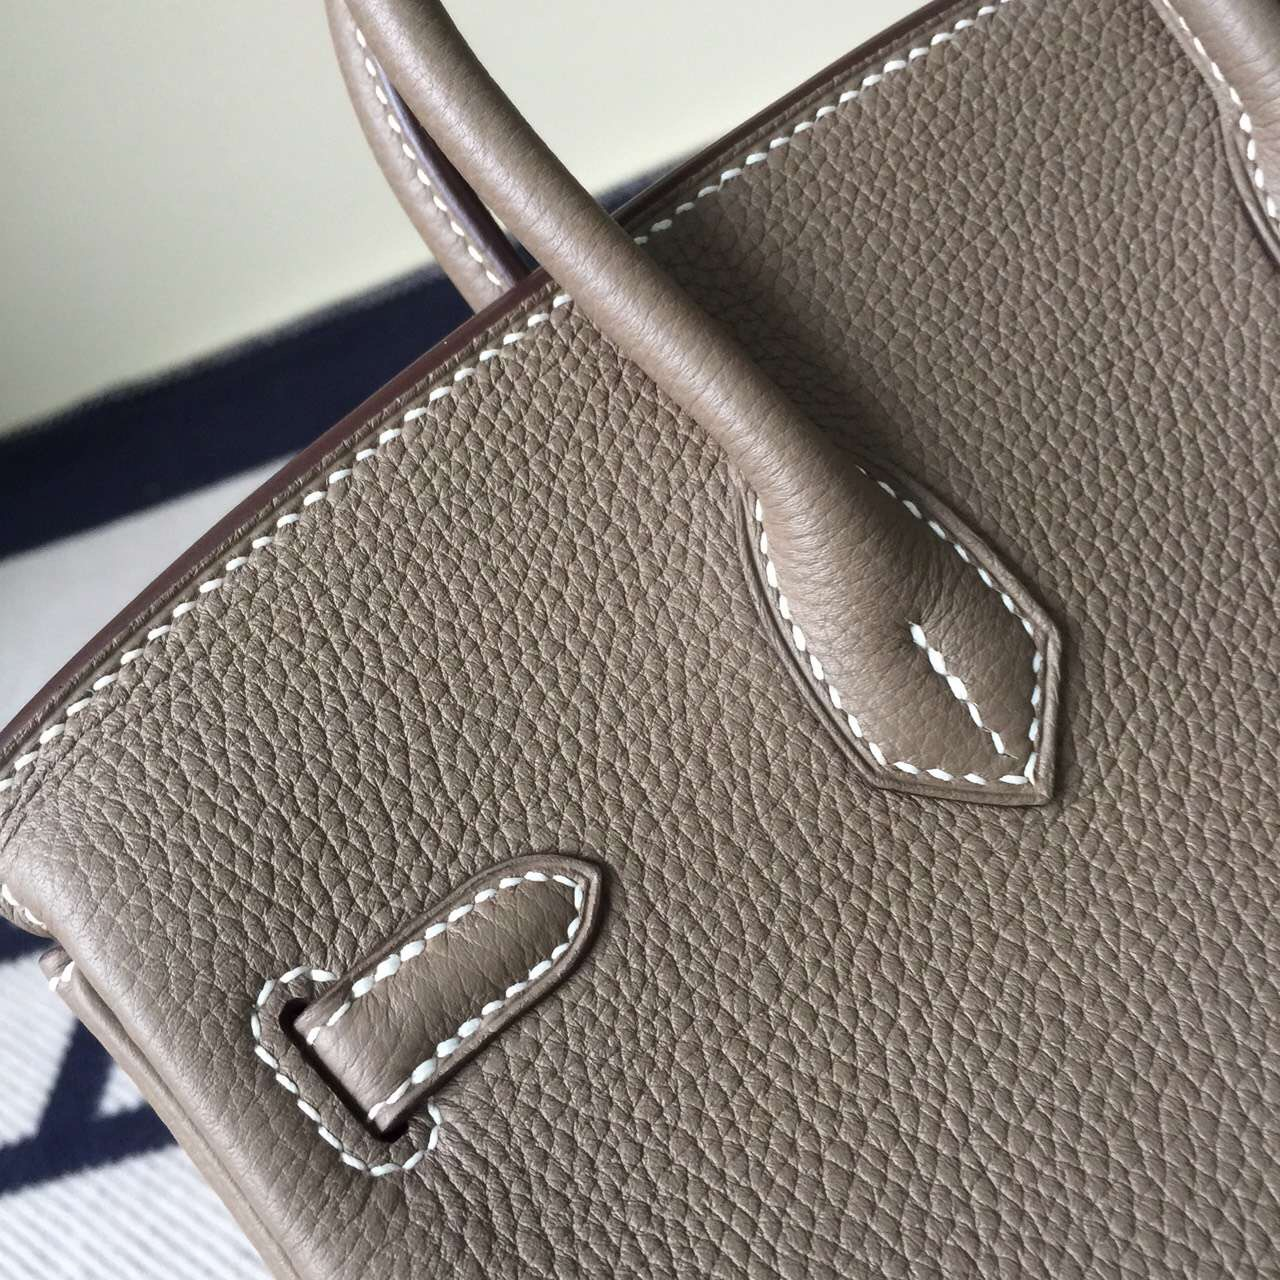 Wholesale Hermes C81 Etoupe Grey Togo Leather Birkin Bag 25cm